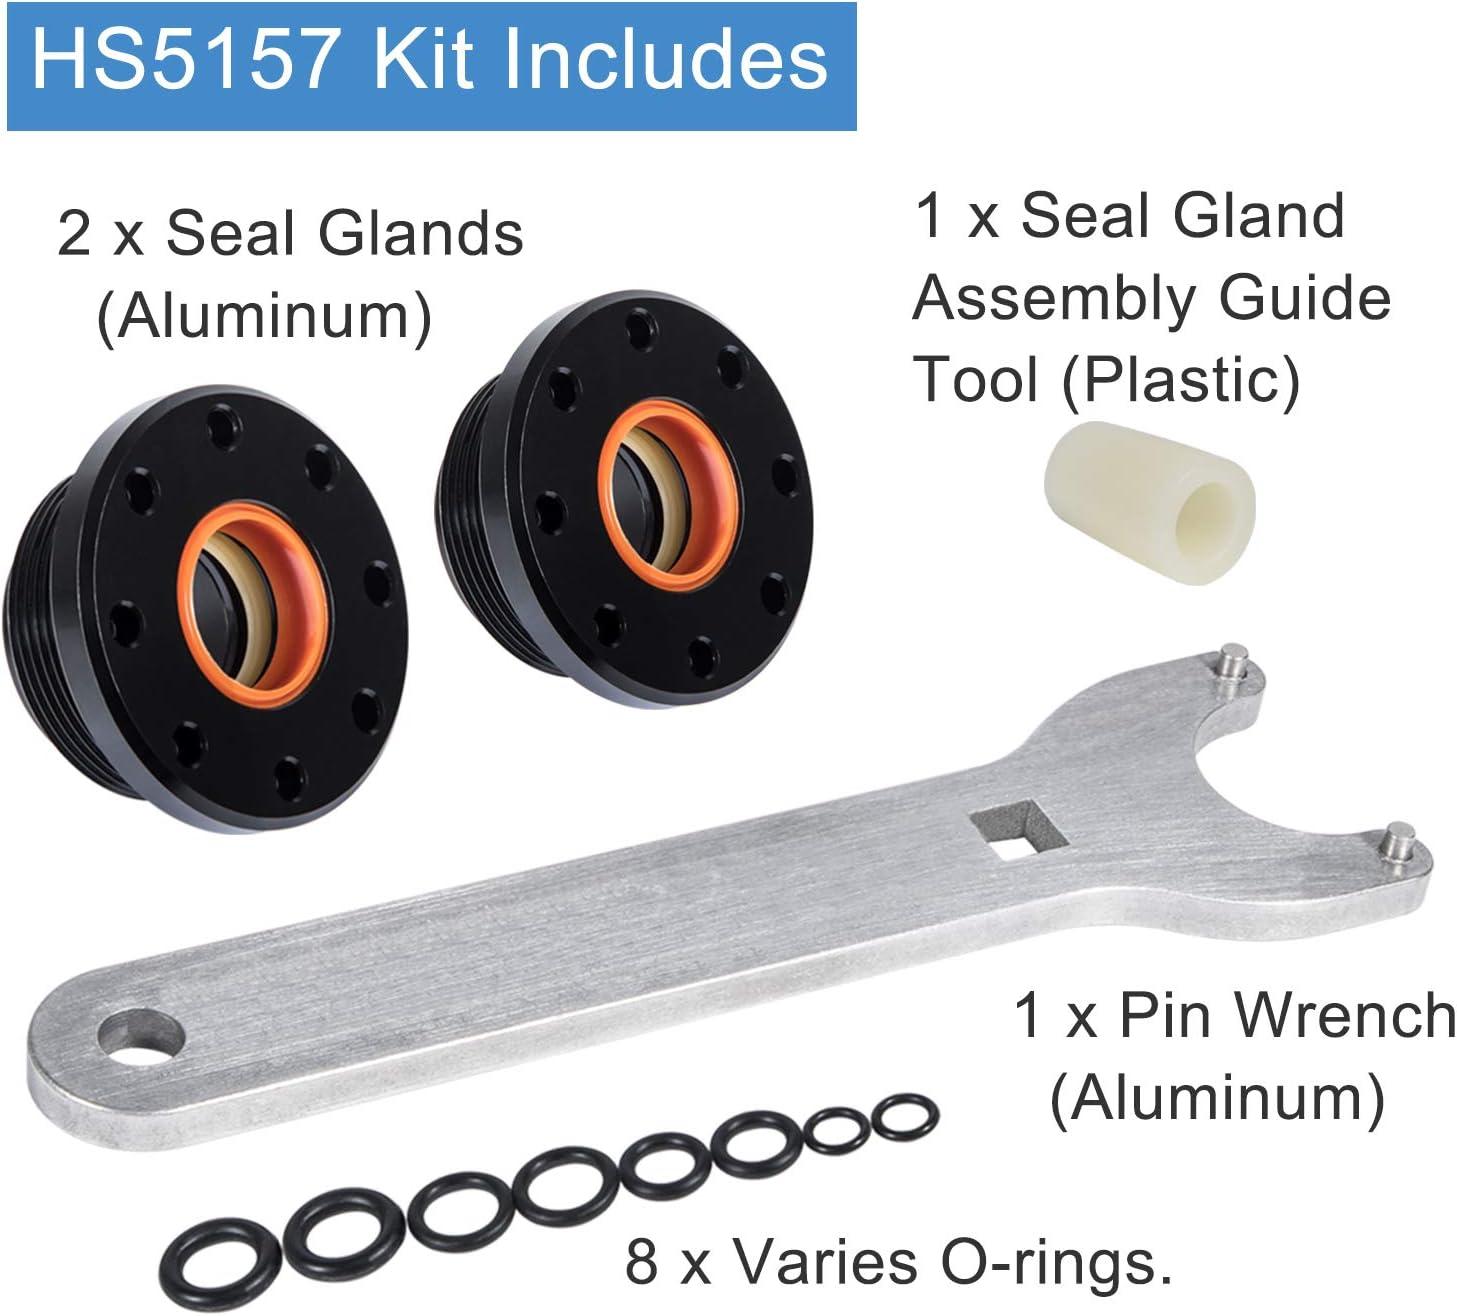 Bleed Kit Filler Kit /& Steering Support Bracket Puller /& #HS5157 Front Mount Hydraulic Steering Cylinder Seal Kit Fits for Seastar Uflex HC5341 HC5348 HC5358 HC5365 HC5375 HC5394 HC5445 HC6750 HC6755